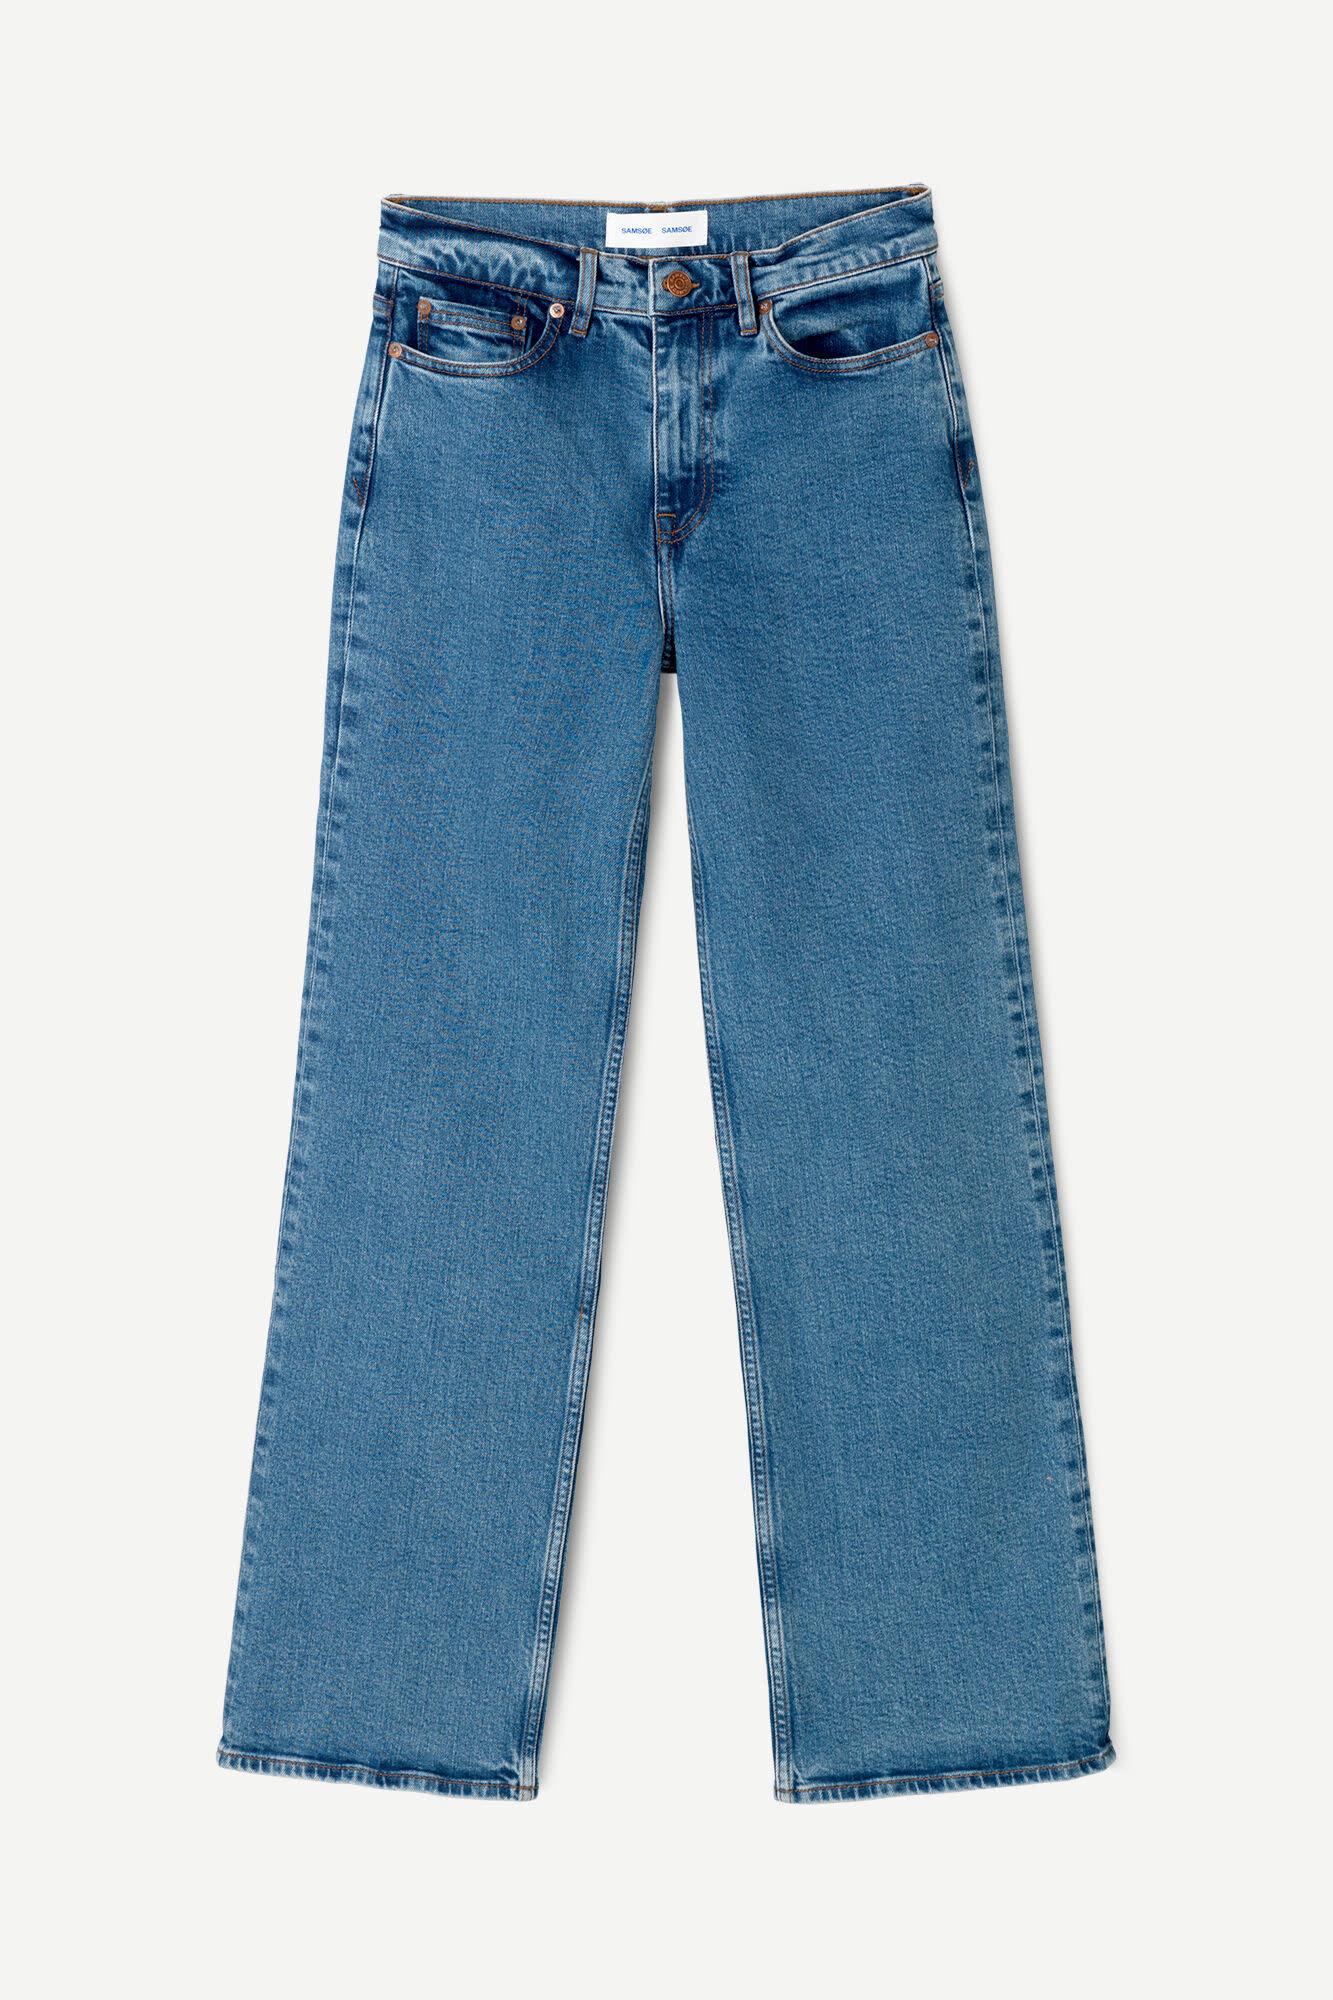 Riley jeans samsoe samsoe-3